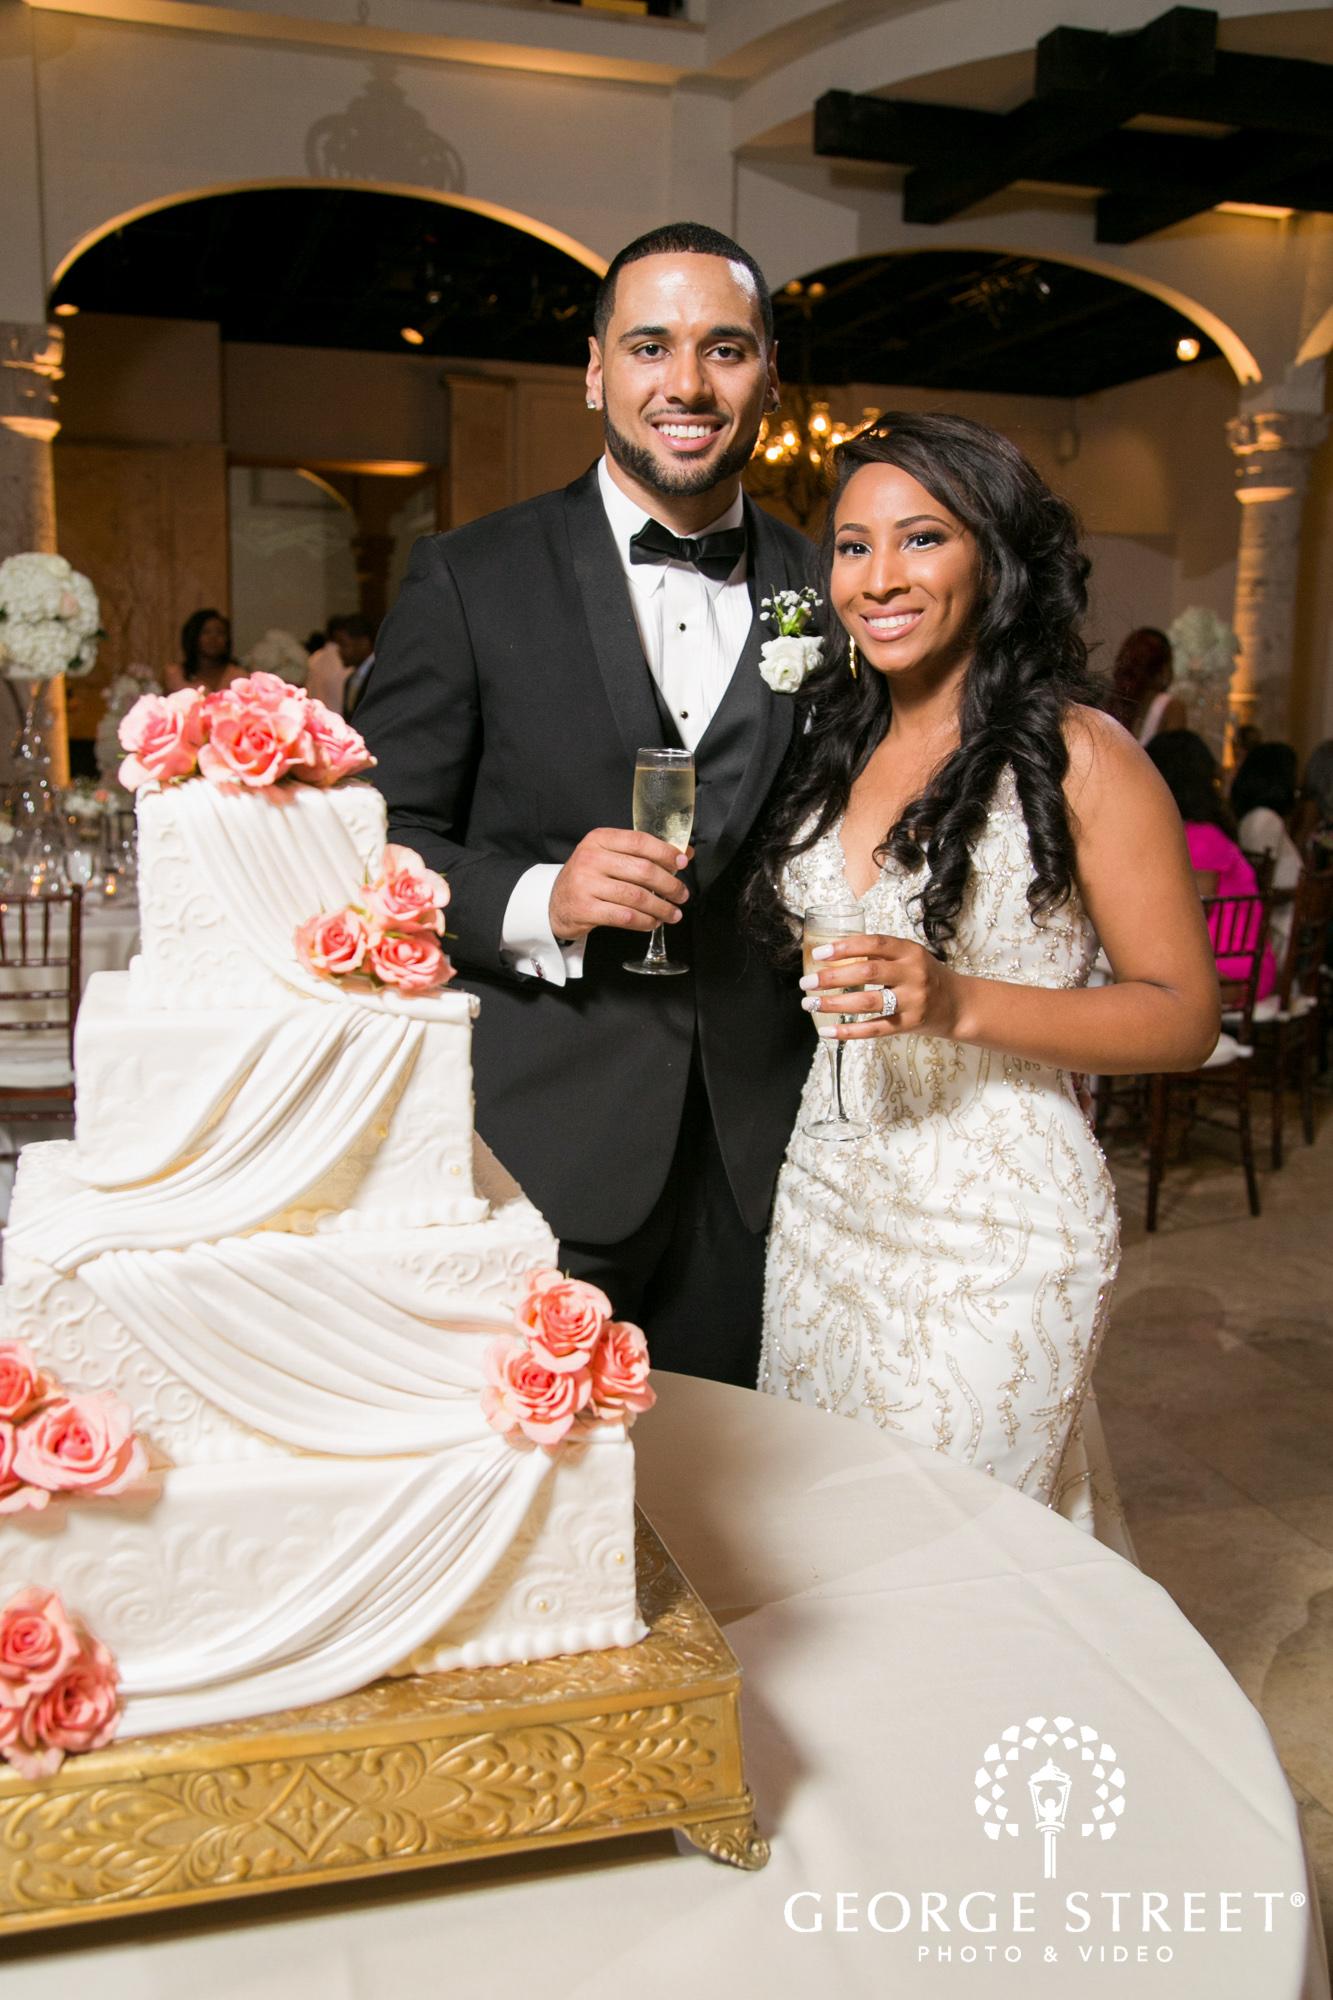 bride and groom cutting wedding cake 3